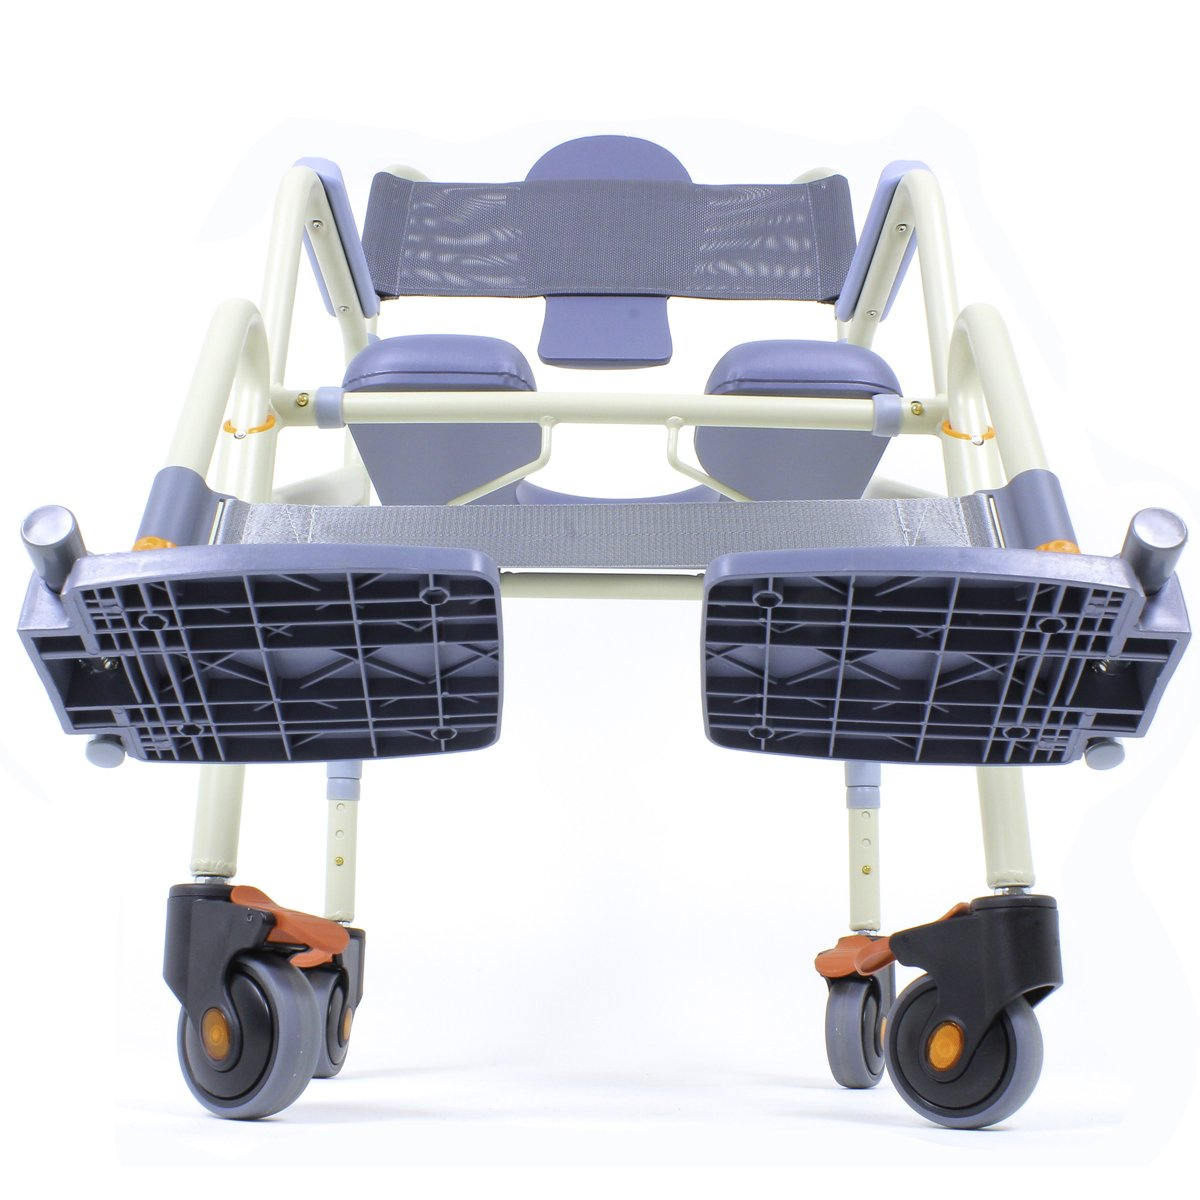 SB7E SHOWERBUDDY ROLL-IN ECO TRAVEL SHOWER CHAIR | MICHIGAN USA